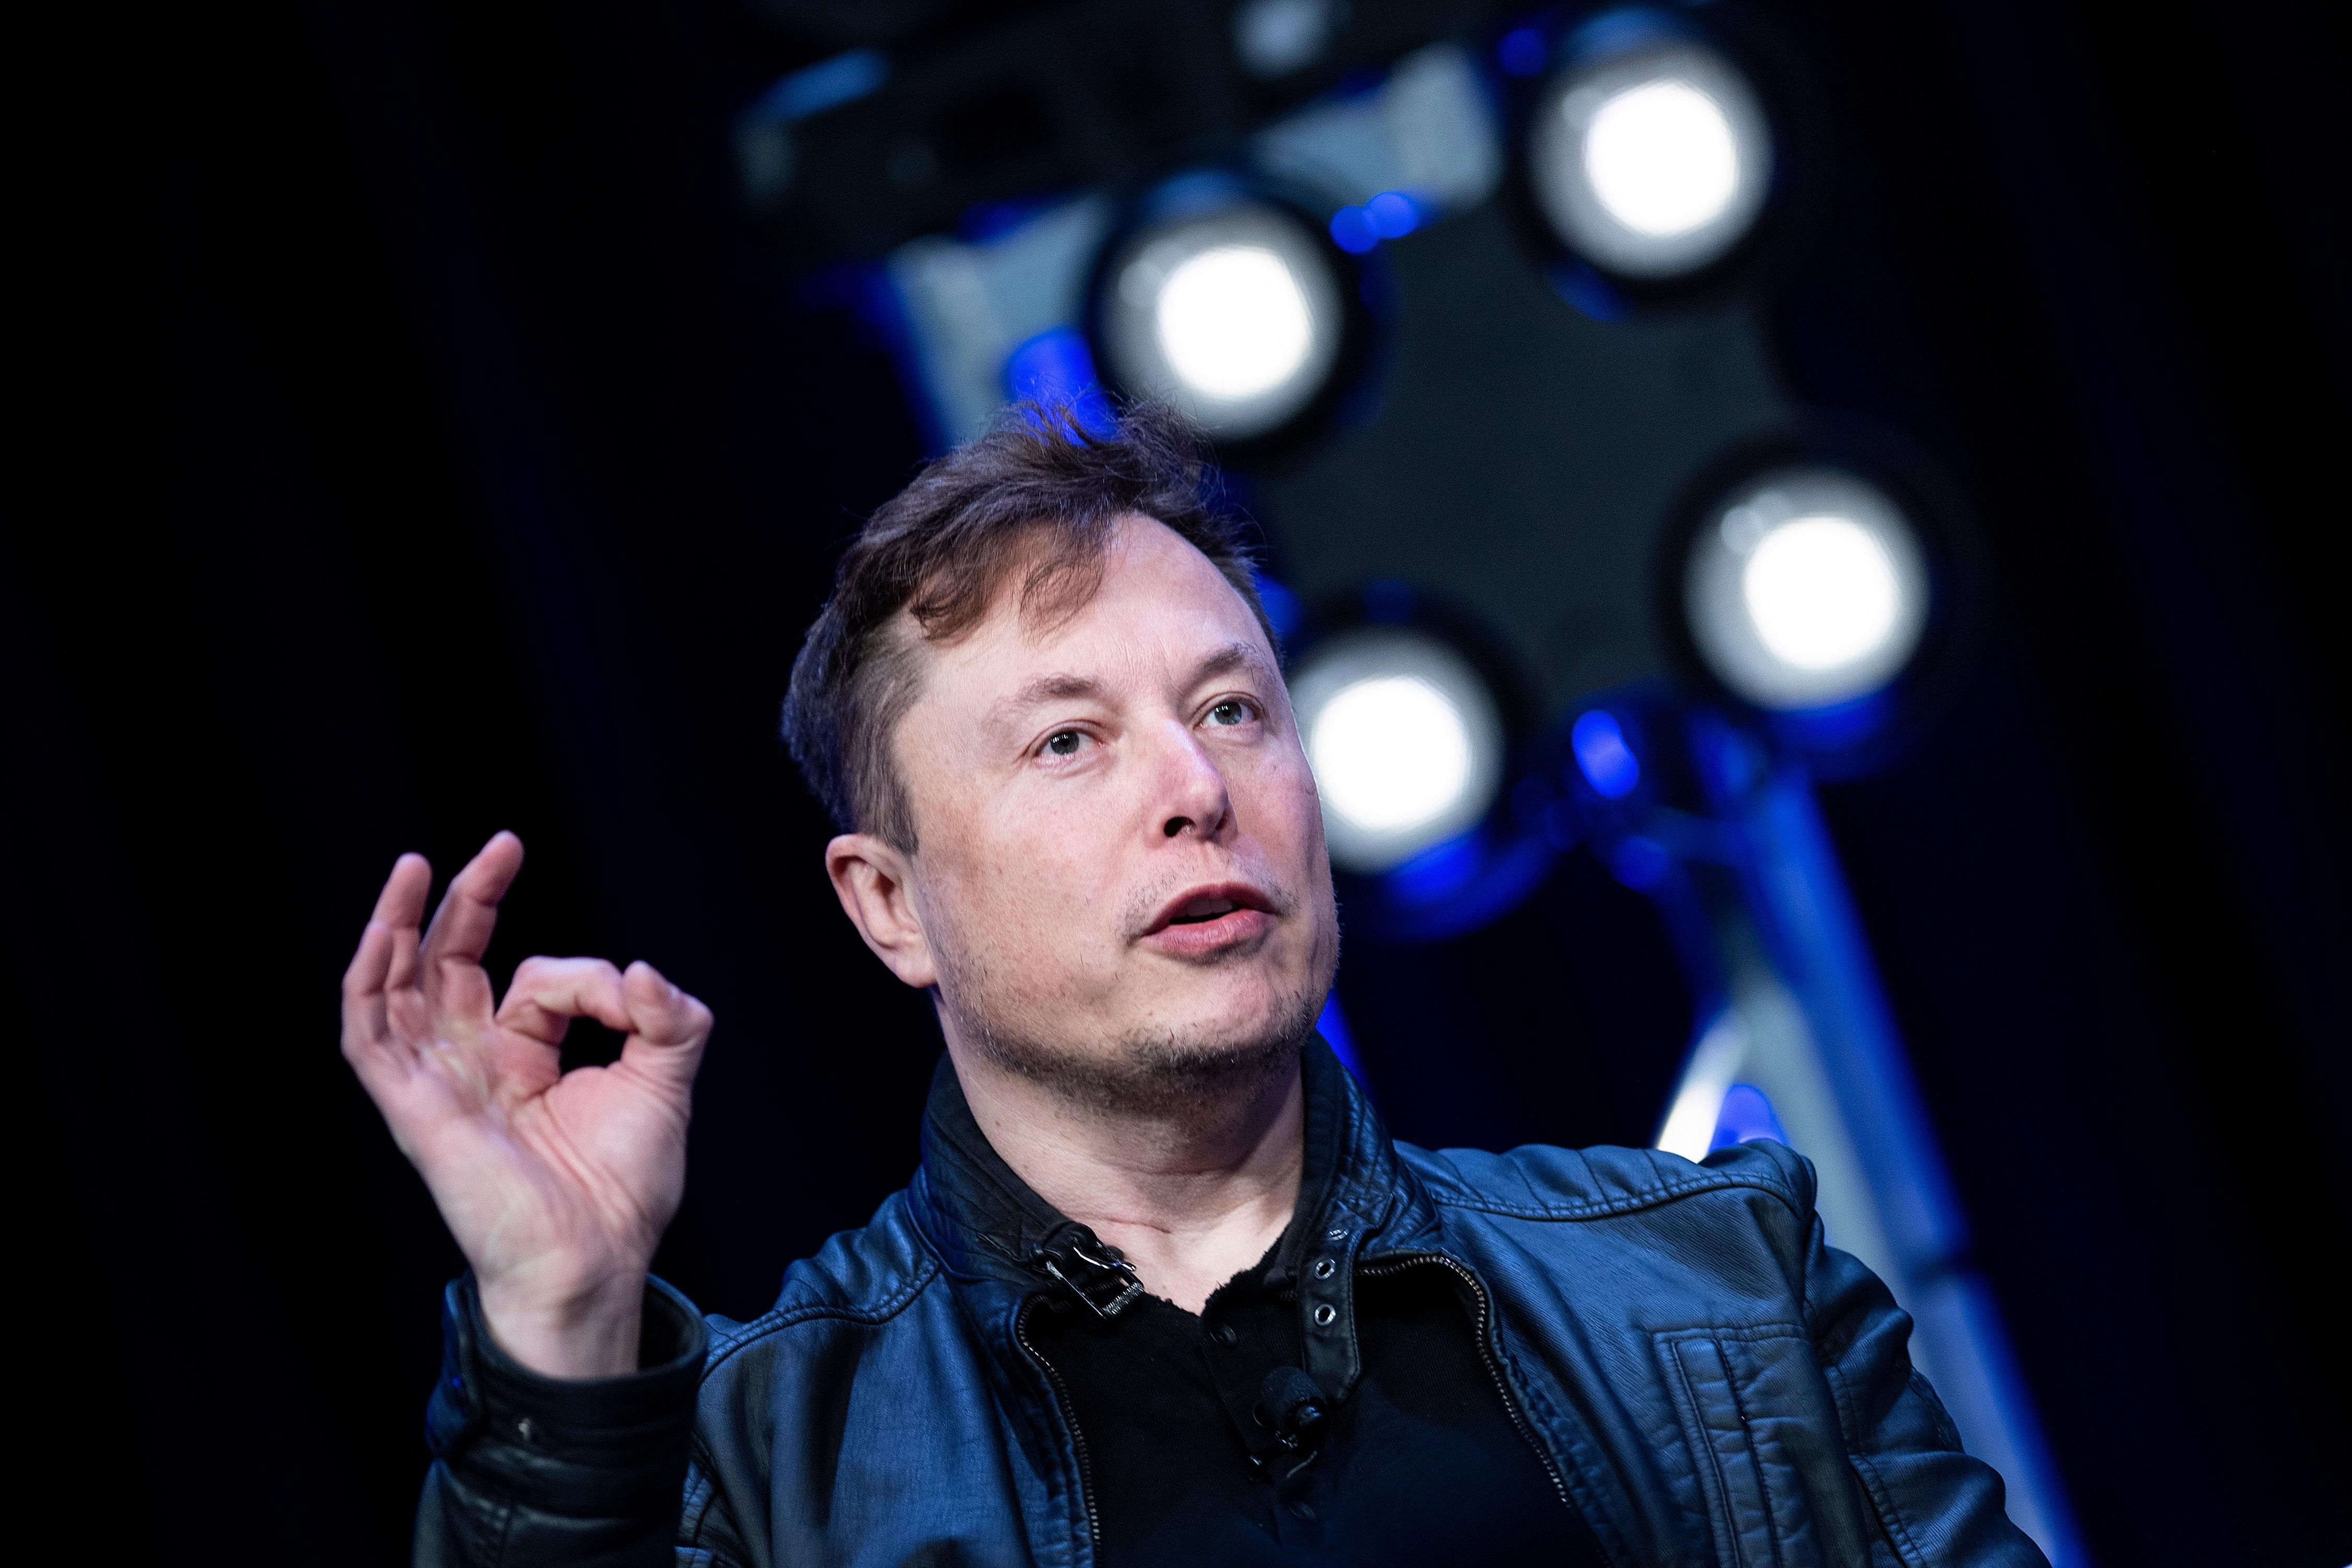 As SpaceX Reaches $36 Billion Valuation, Elon Musk Clarifies Starlink IPO Rumors